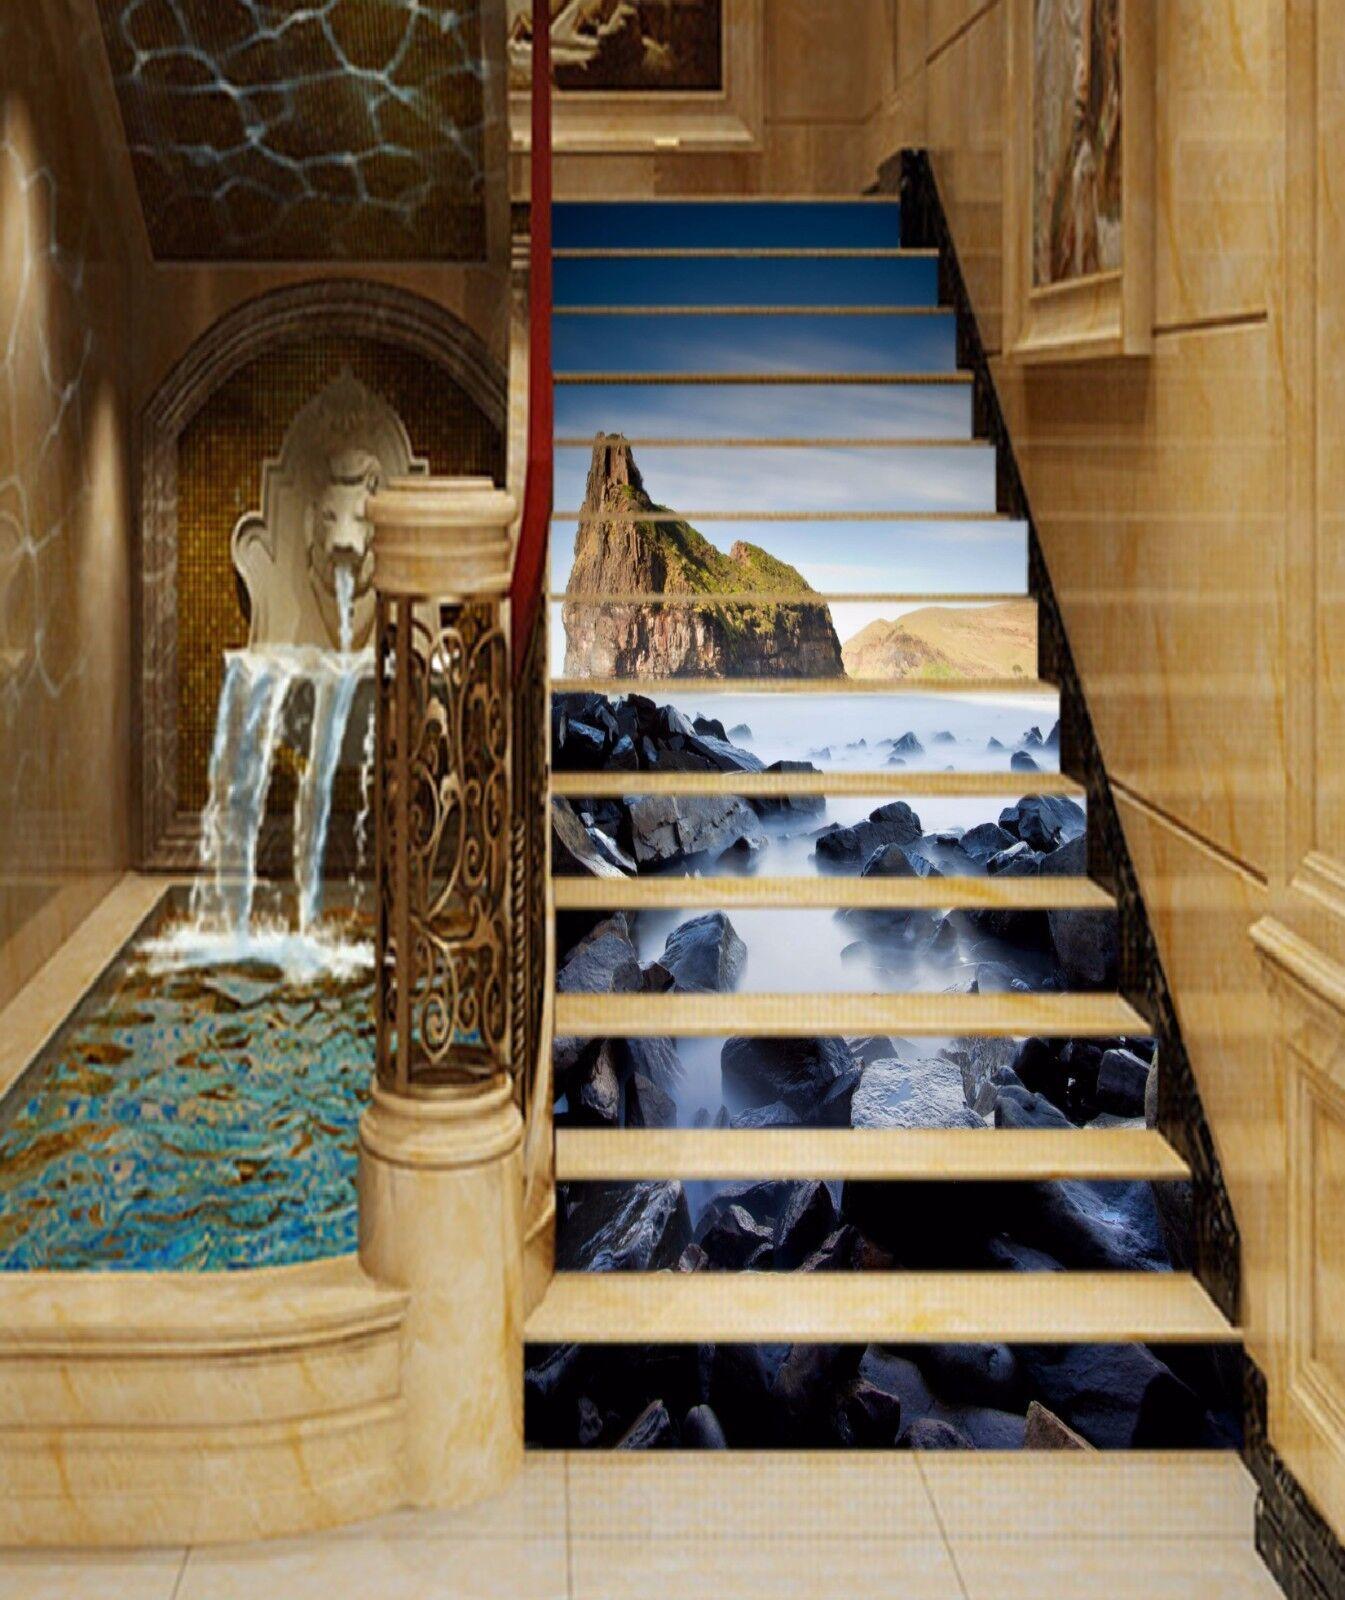 3D Stones Mountain Stair Risers Decoration Photo Mural Vinyl Decal Wallpaper AU